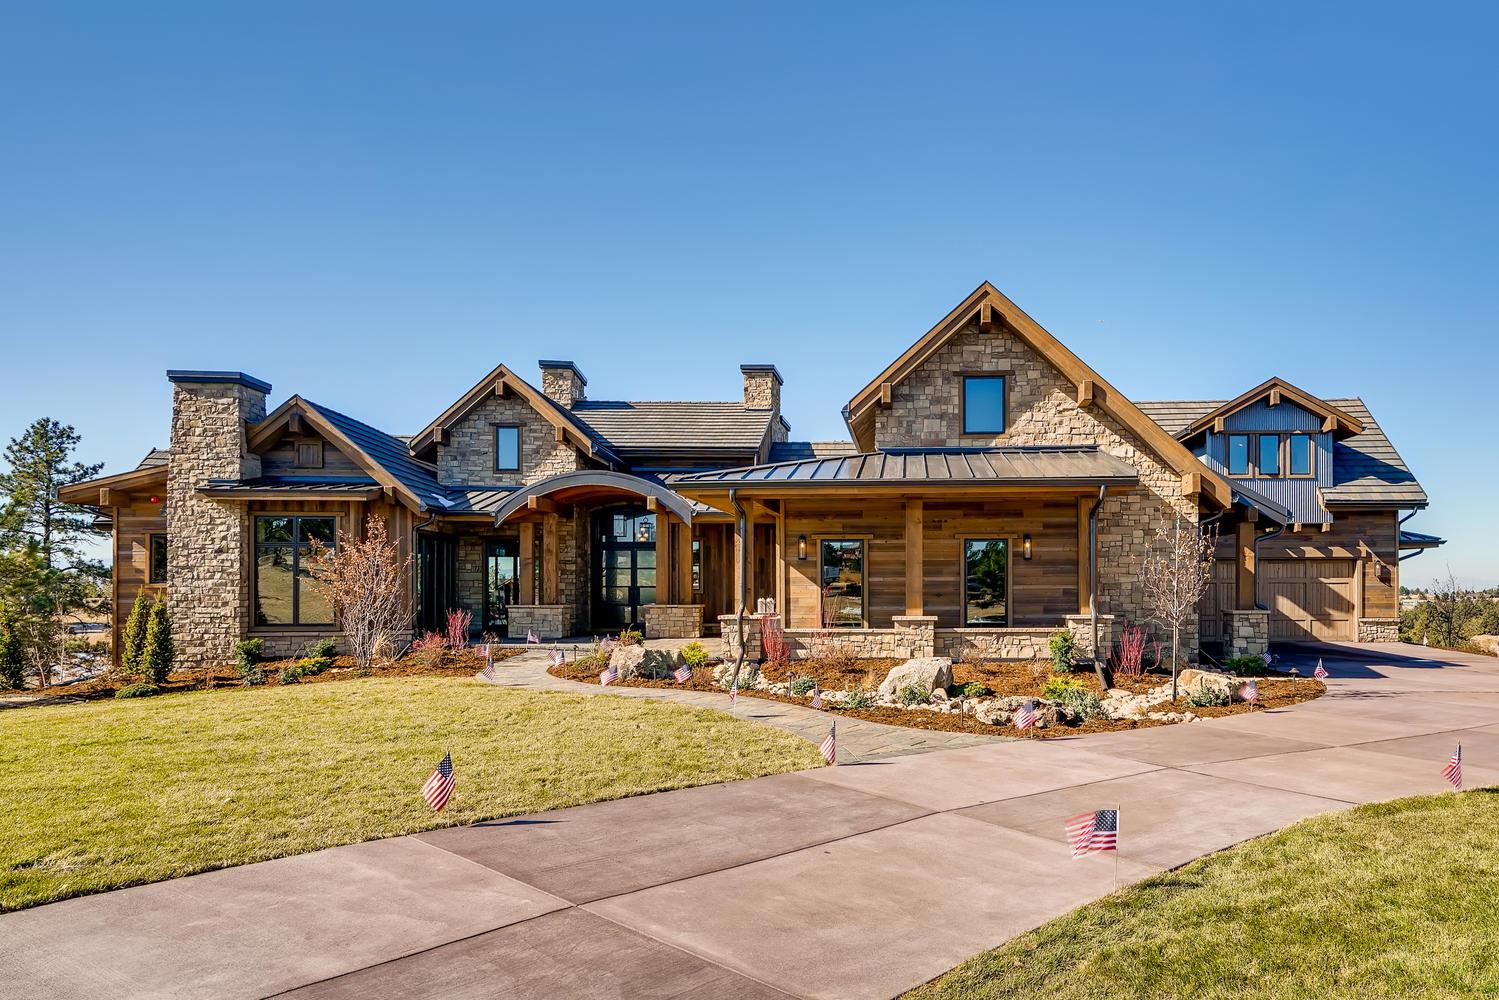 Custom Mountain Modern home in Colorado by award-winning firm, Godden Sudik Architects